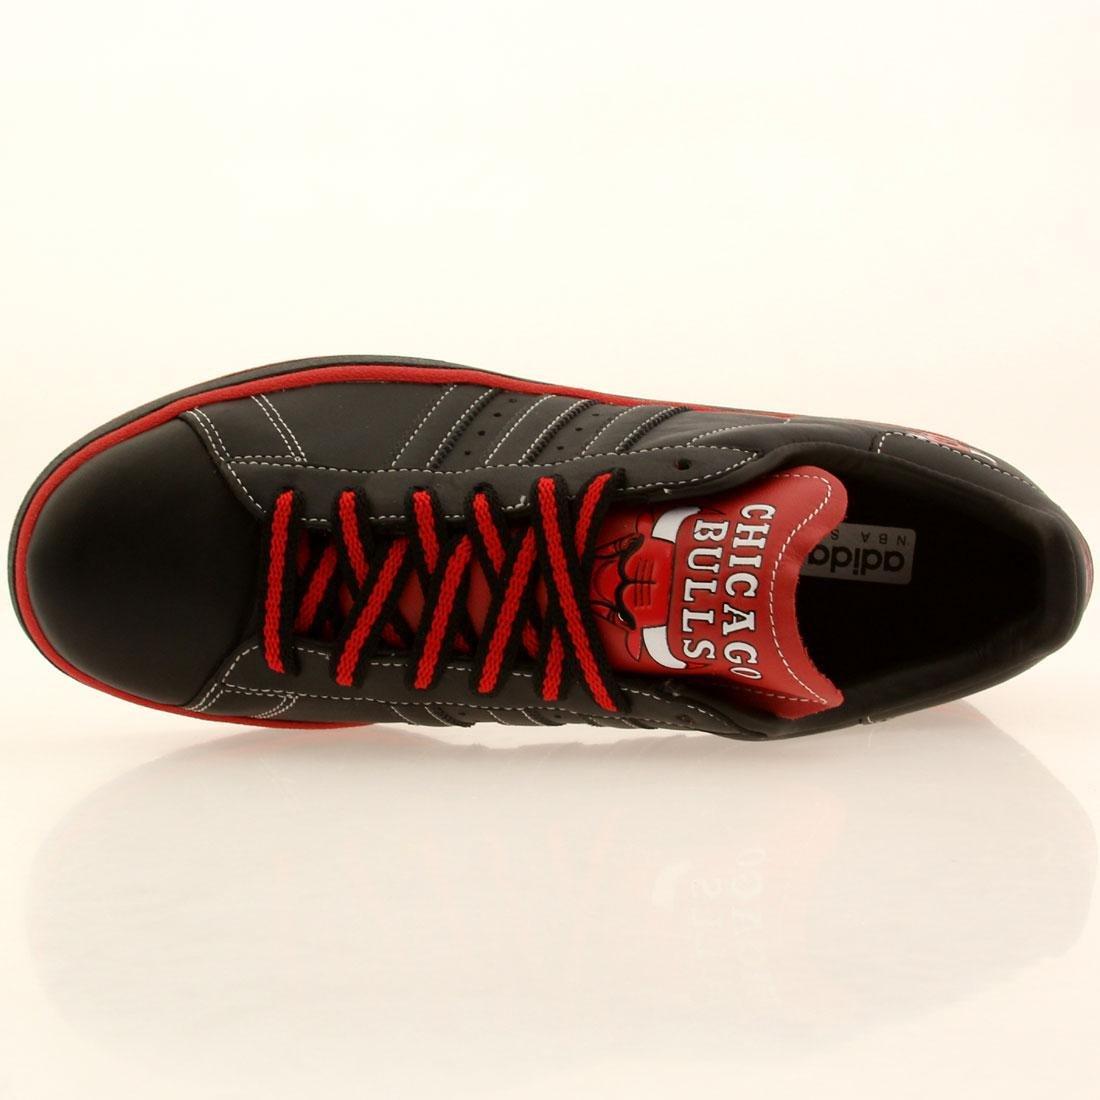 newest 7c271 4d4c5 Adidas Men Campus II Plus - Chicago Bulls (black redsld) Size 10.5 US   Amazon.ca  Shoes   Handbags